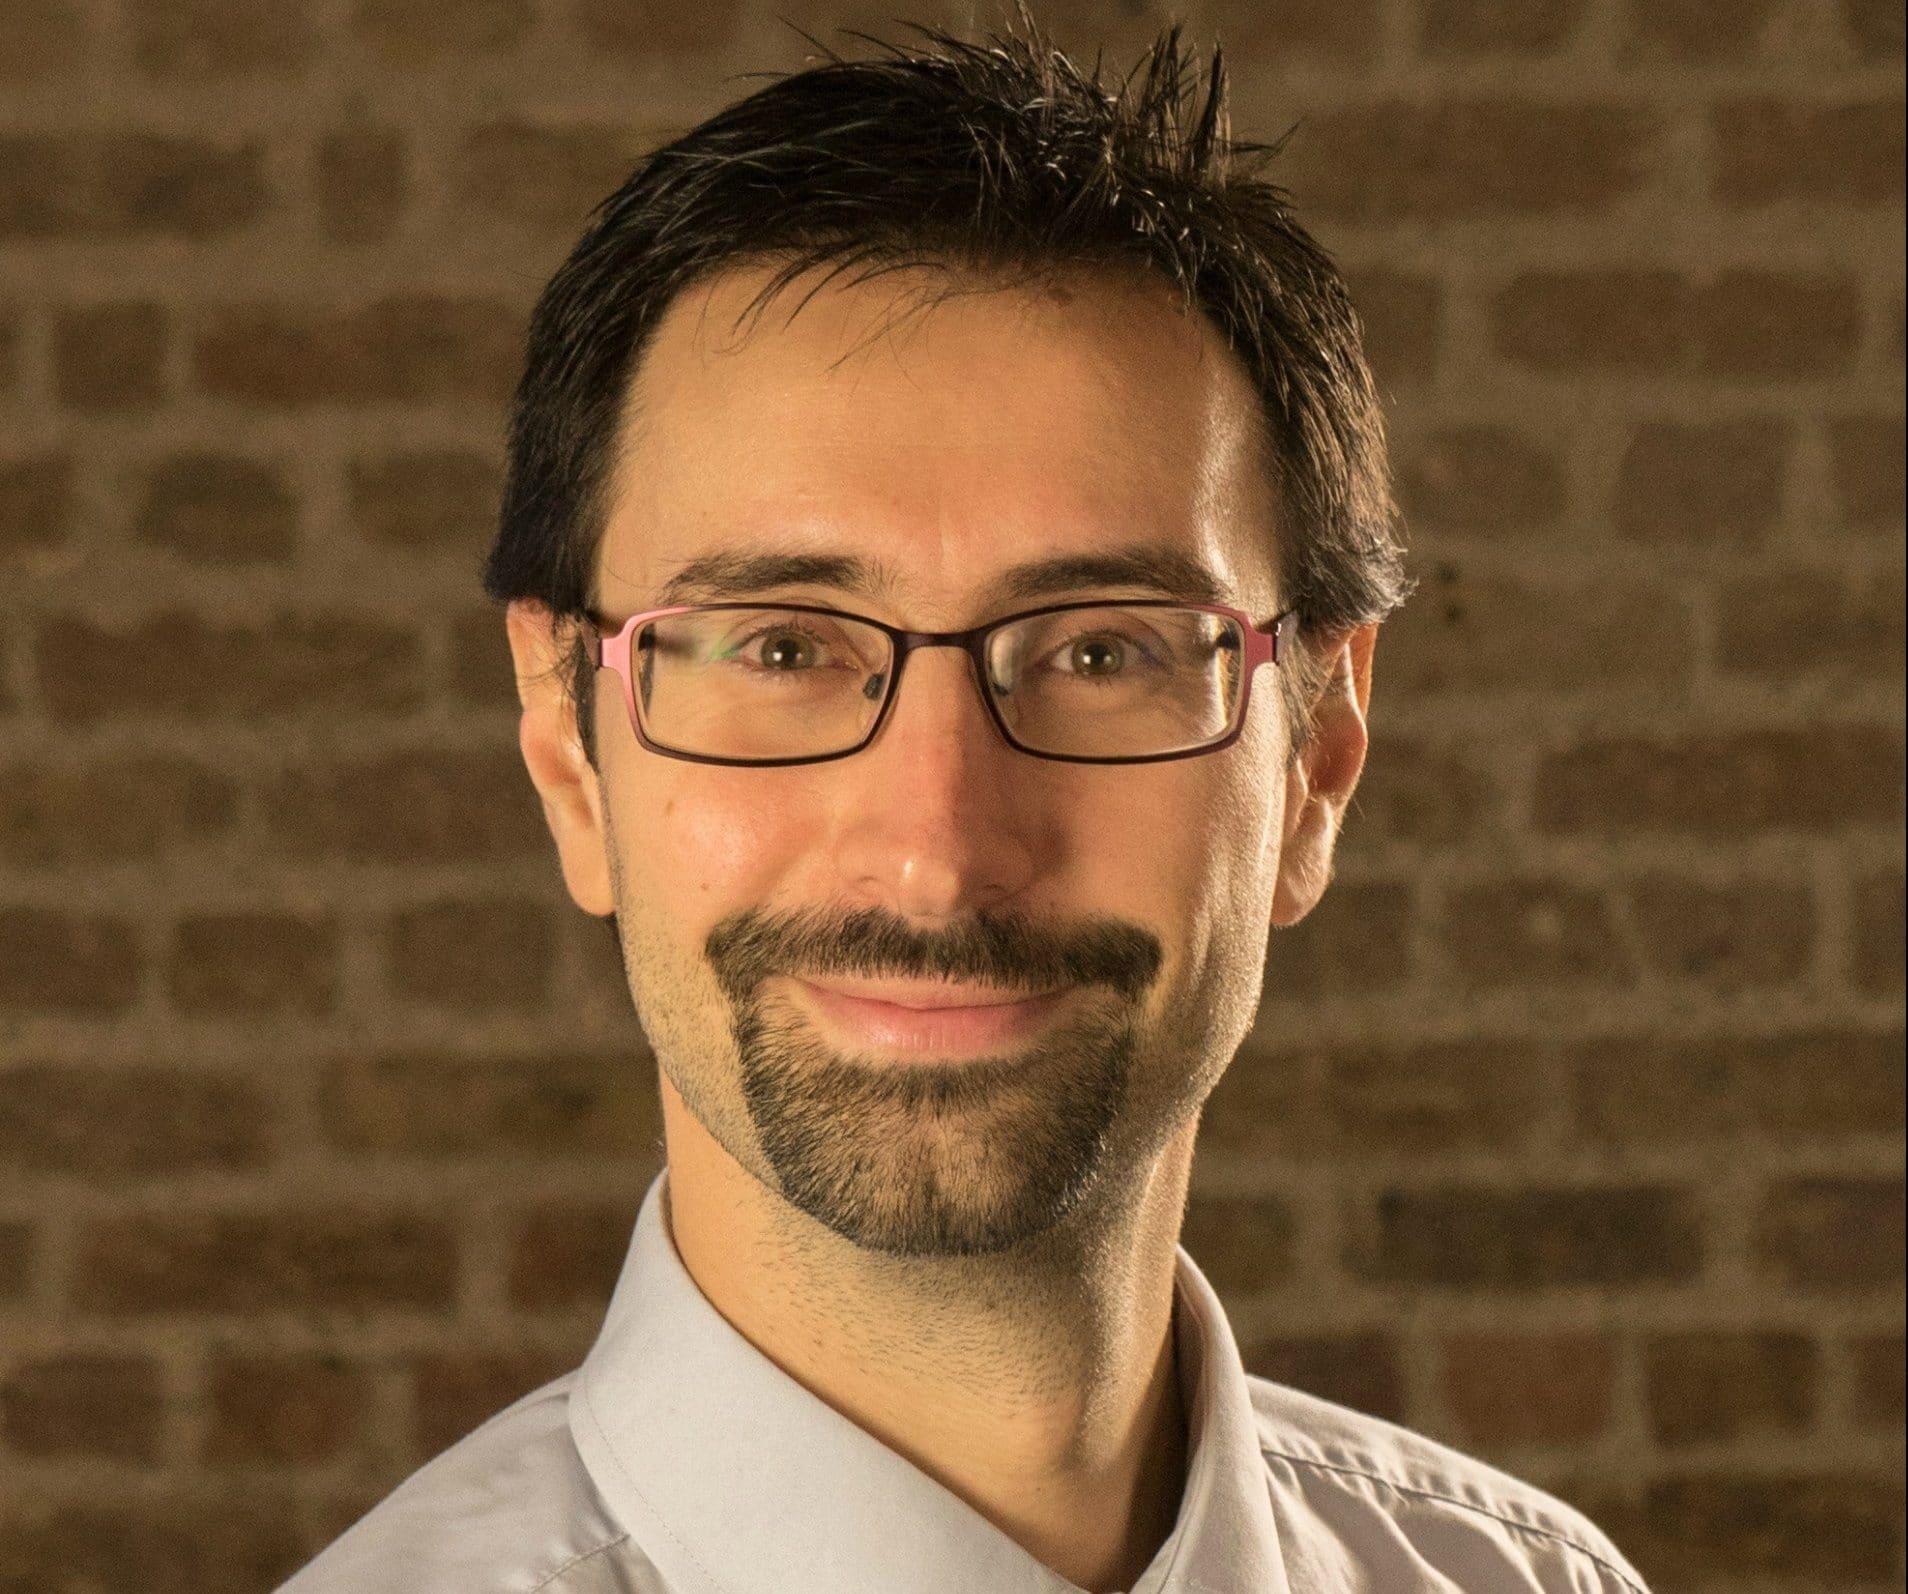 L'esperienza di Marco, consulente marketing di AIVM | aivm.it